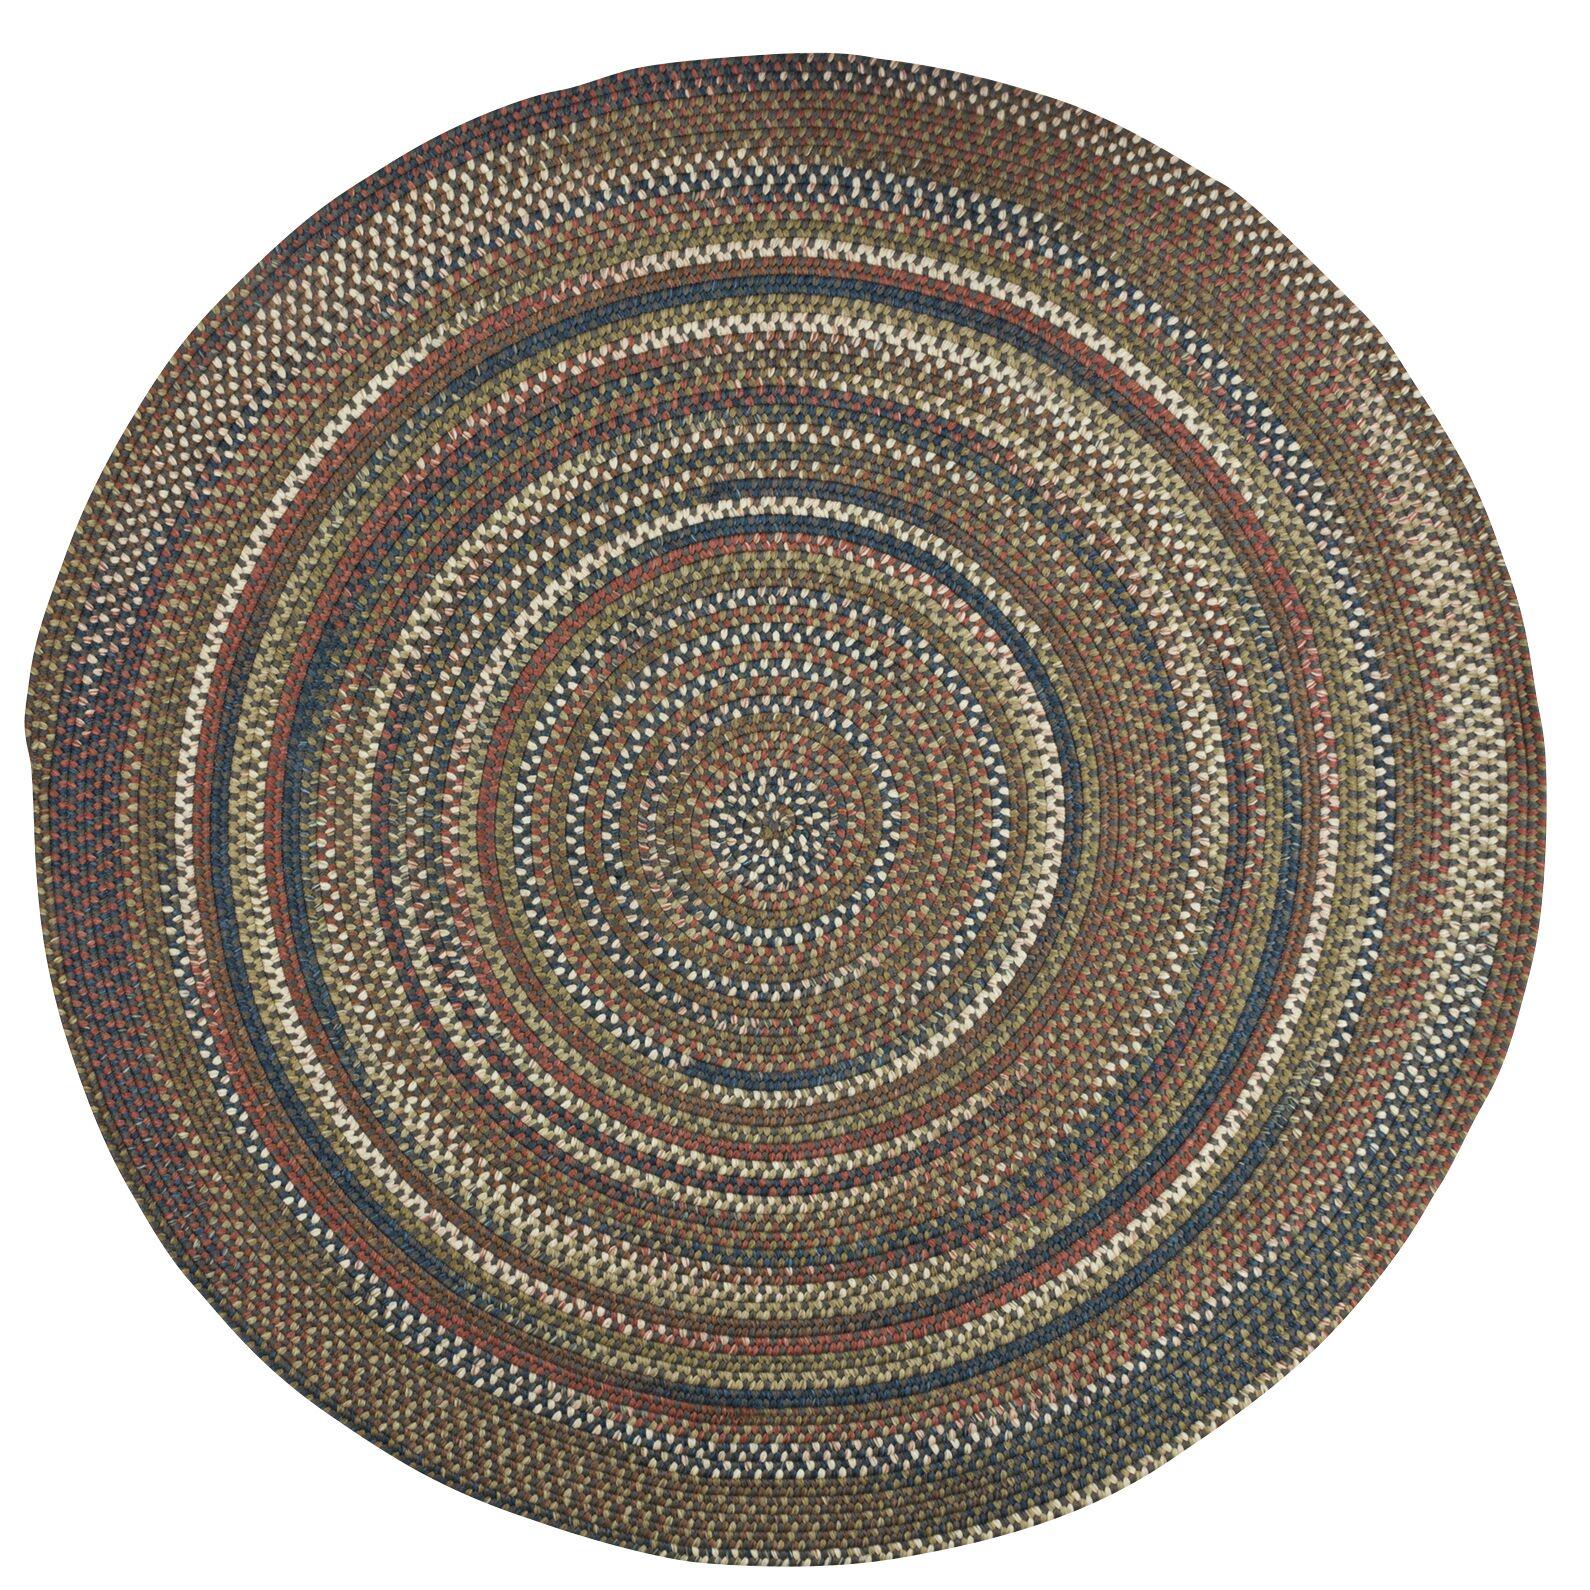 Kipton Gray Area Rug Rug Size: Round 10'